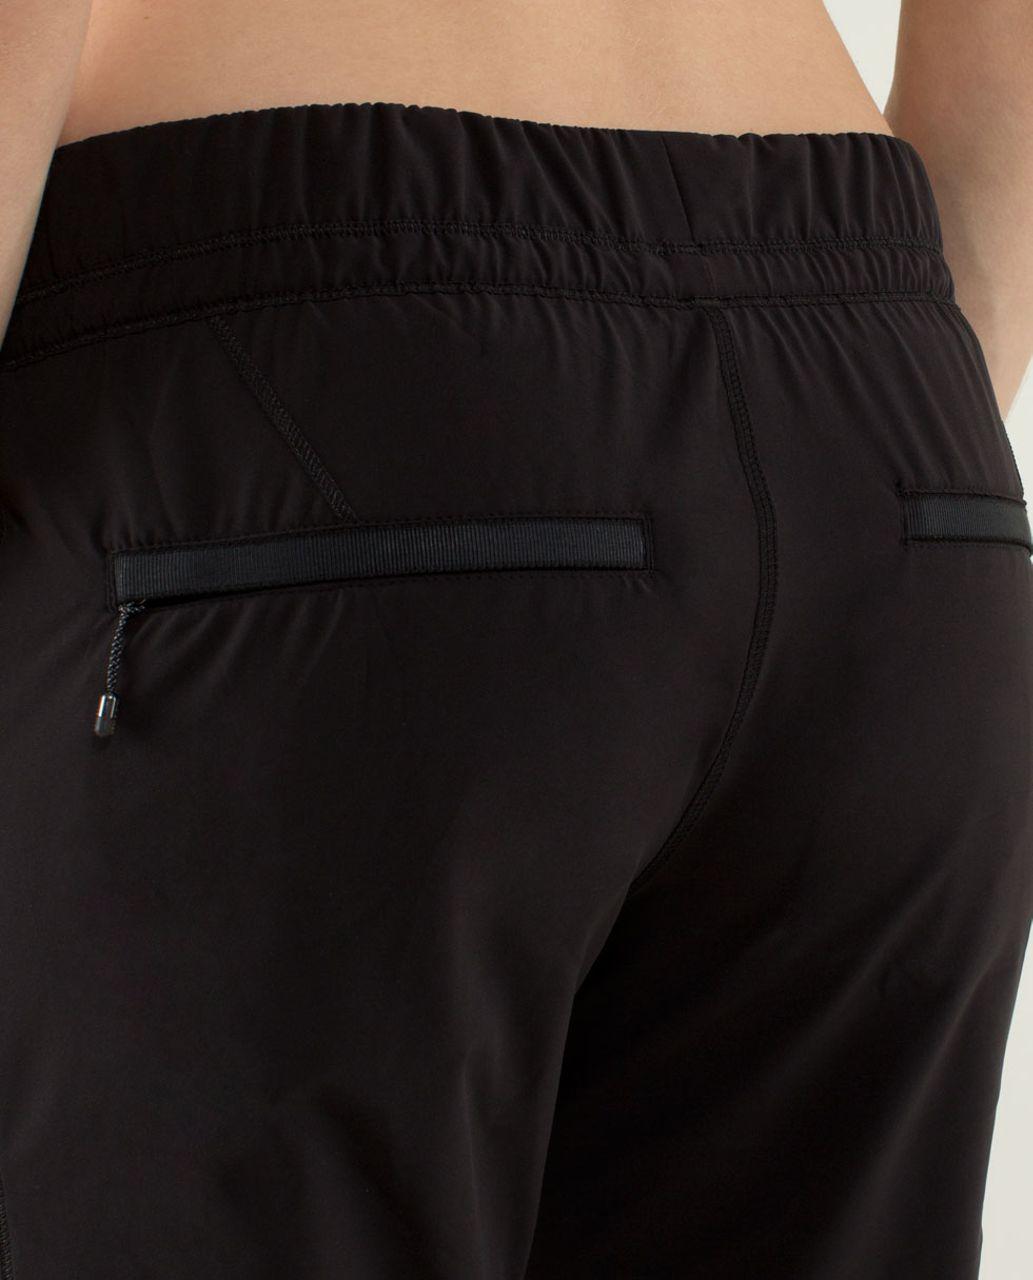 Lululemon Run Bandit Track Pant - Black